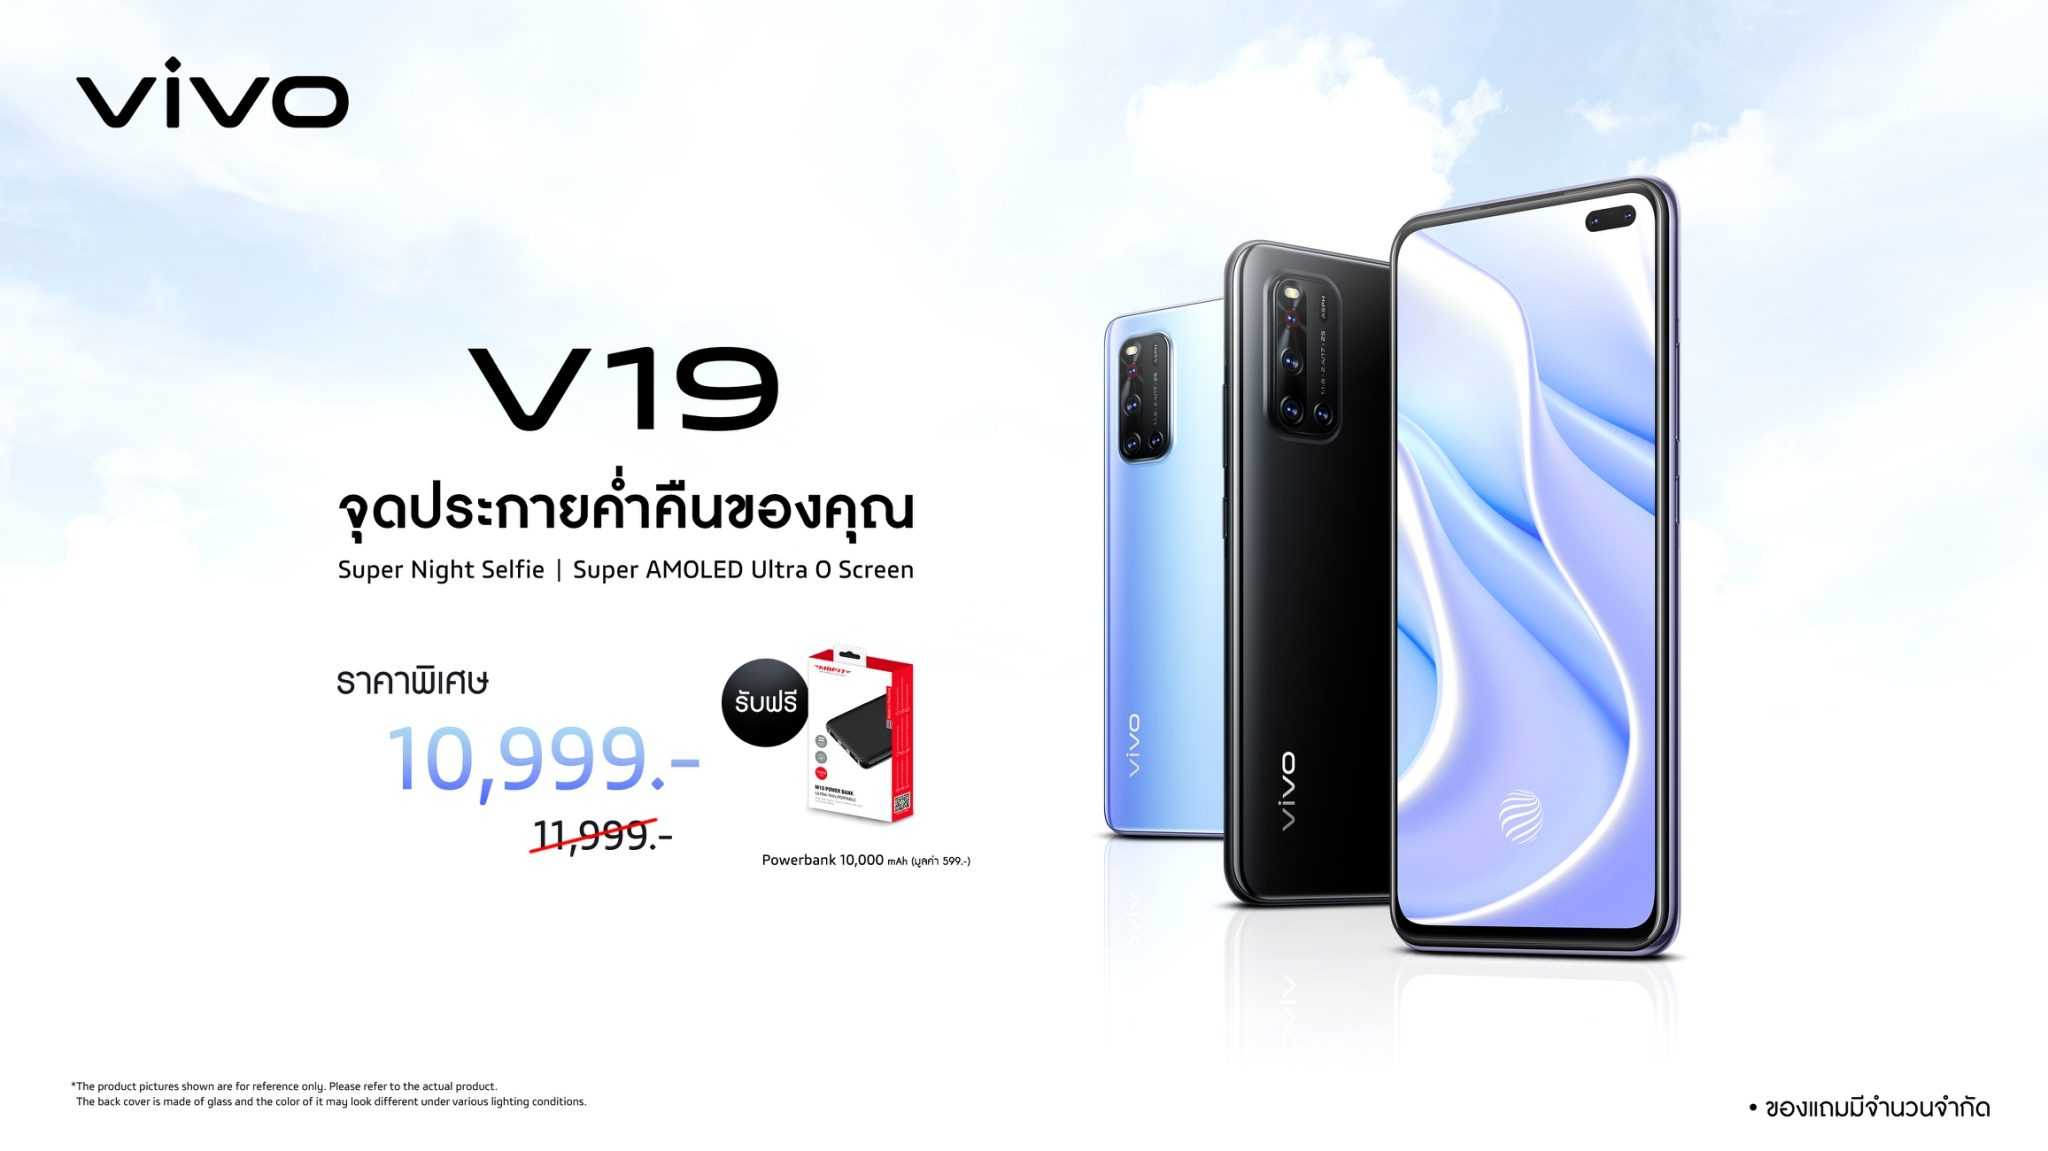 Vivo V19 สมาร์ตโฟนกล้องหน้าคู่สุดล้ำ ราคาใหม่เพียง 10,999 บาท พร้อมรับฟรี Power bank